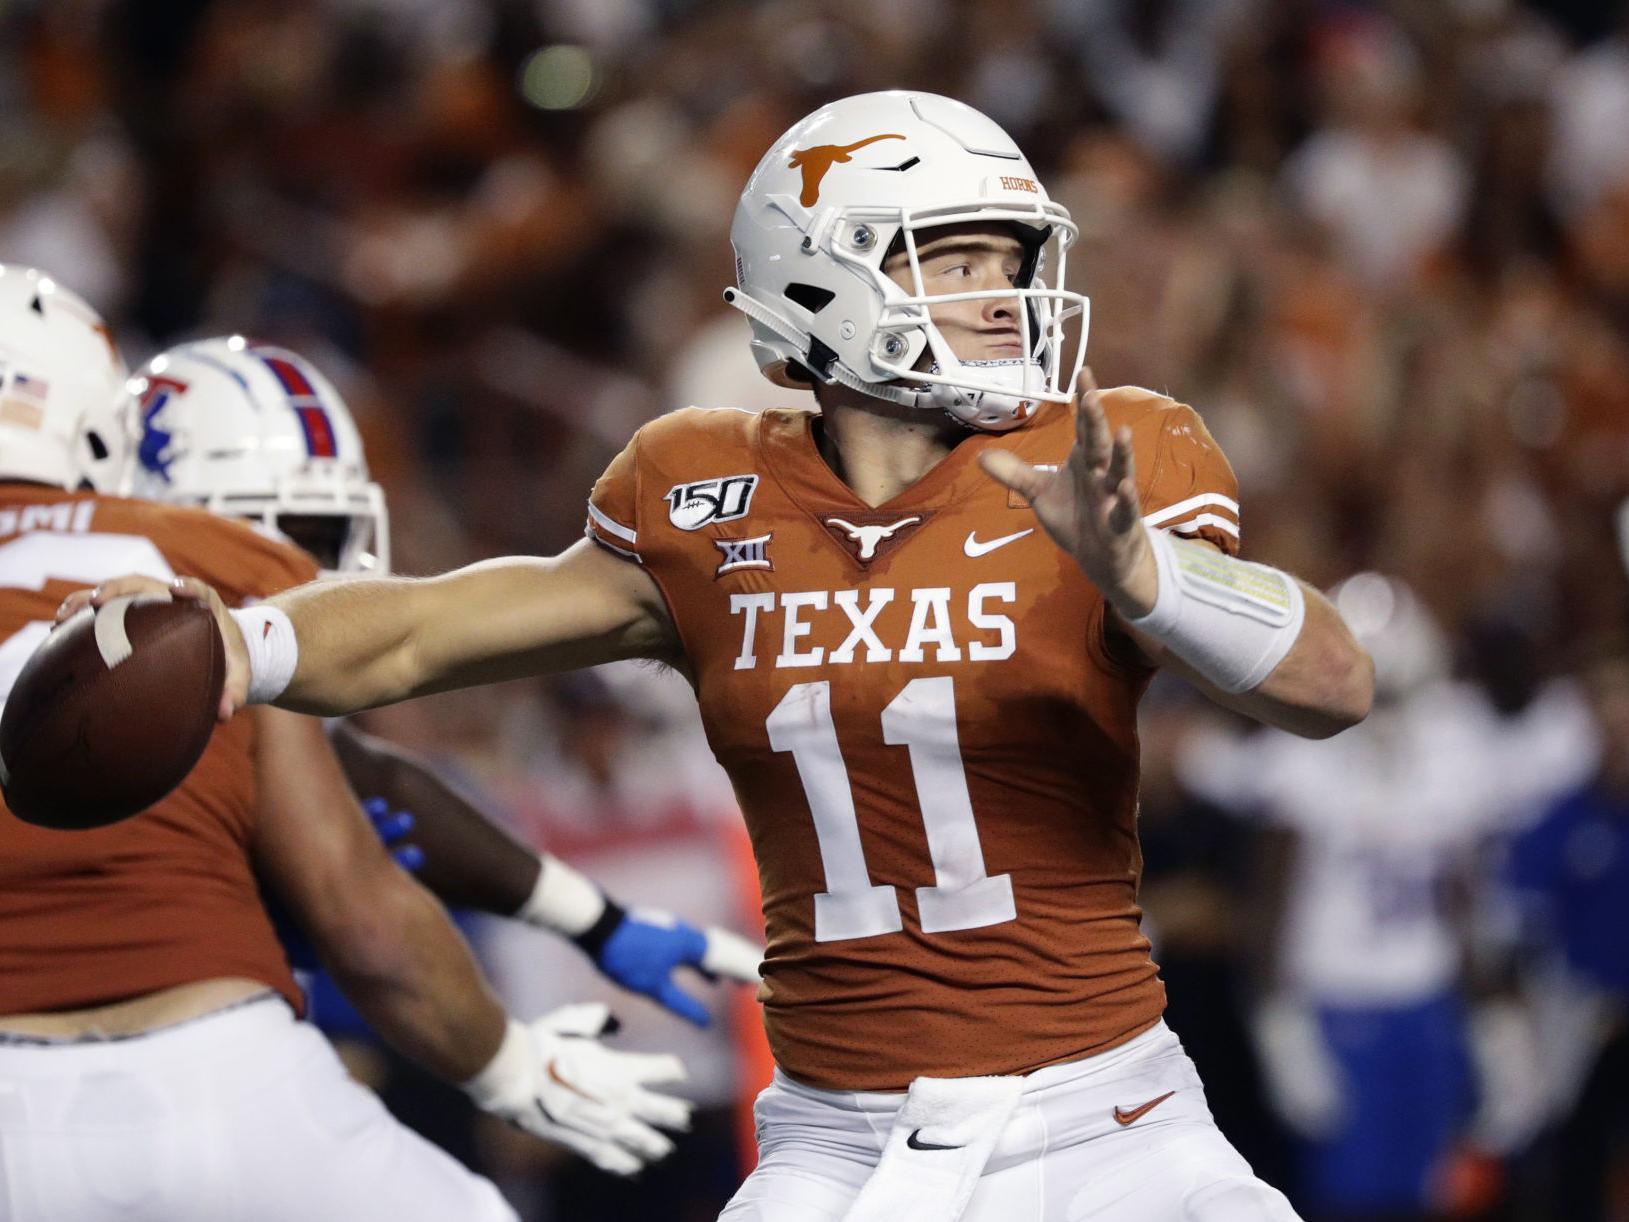 Texas Longhorns Qb Sam Ehlinger On Facing The Lsu Secondary Joe Burrow The Game Plan Lsu Theadvocate Com